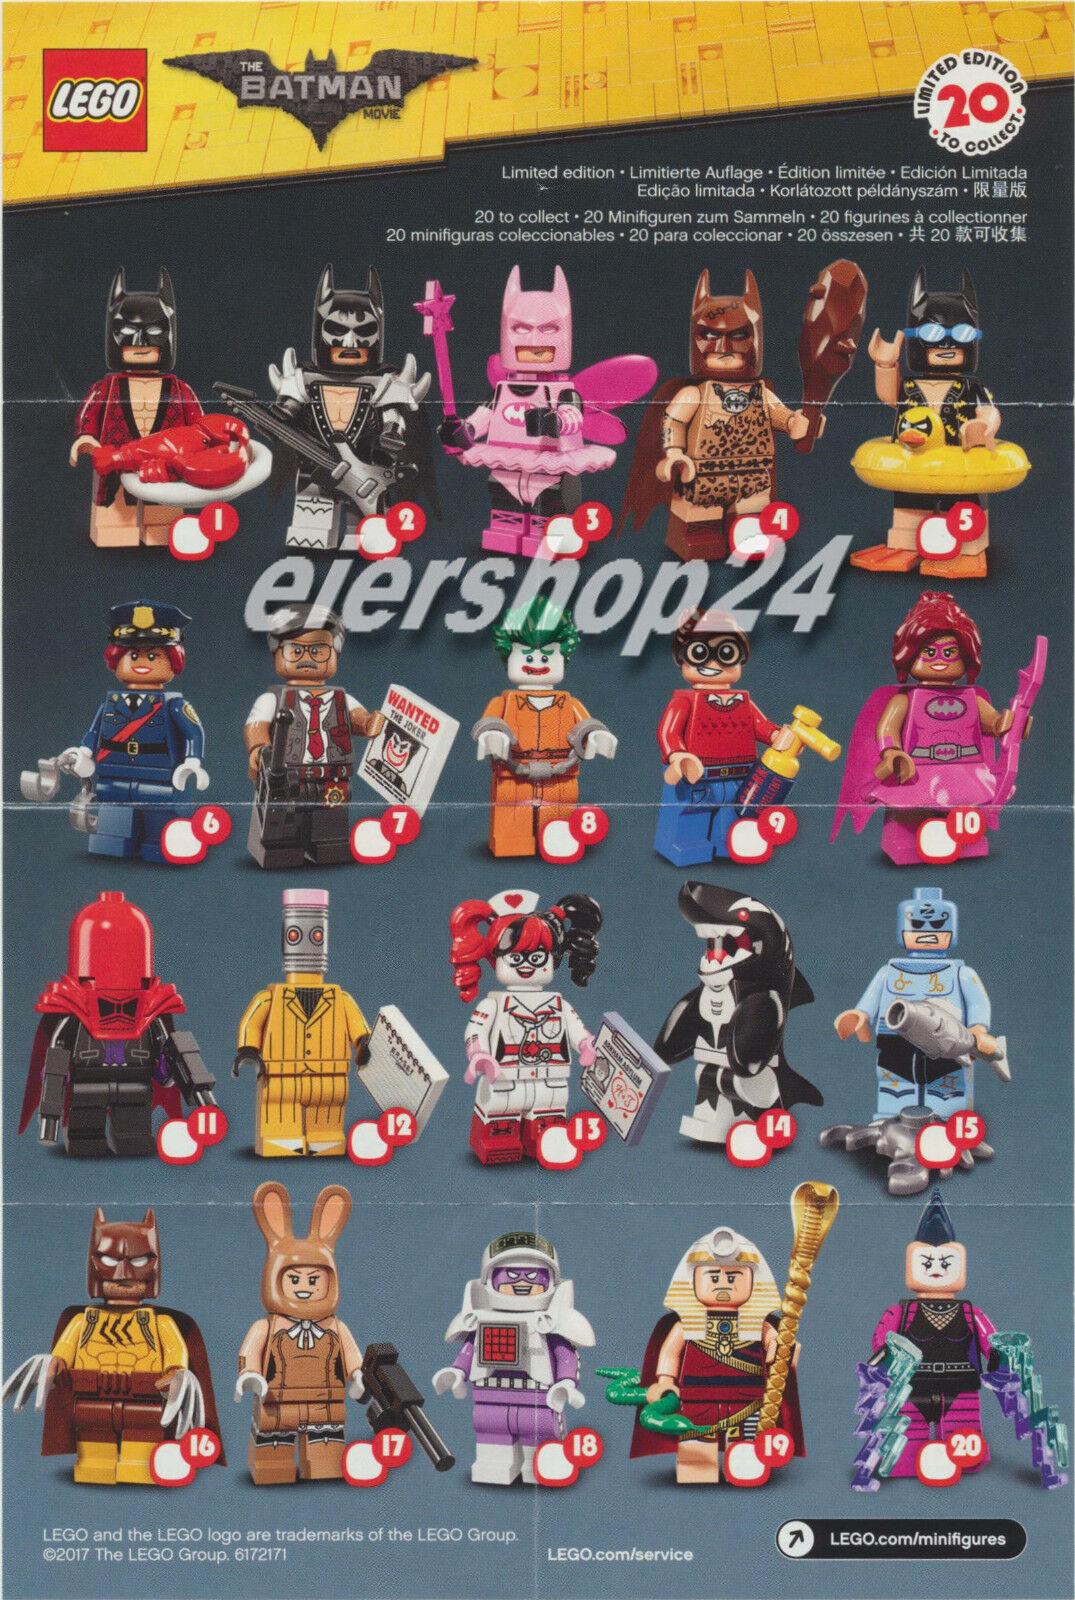 Complet jeu LEGO ® minifiguren minifiguren minifiguren BatFemme Movie #71017 toutes les 20 fig. complet NEUF 299379